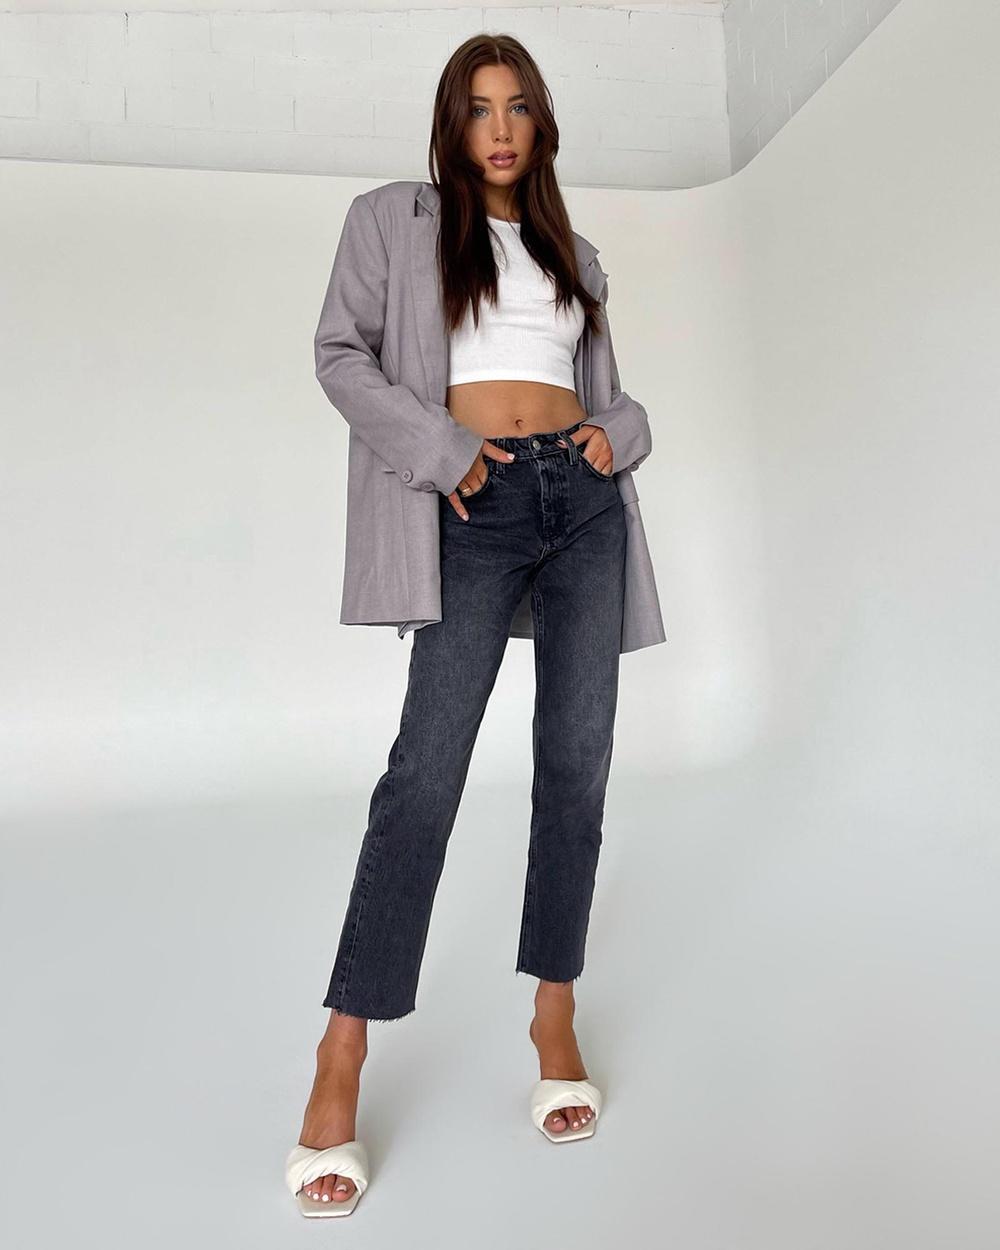 TOPSHOP Washed Raw Hem Straight Leg Jeans High-Waisted Light Black Australia